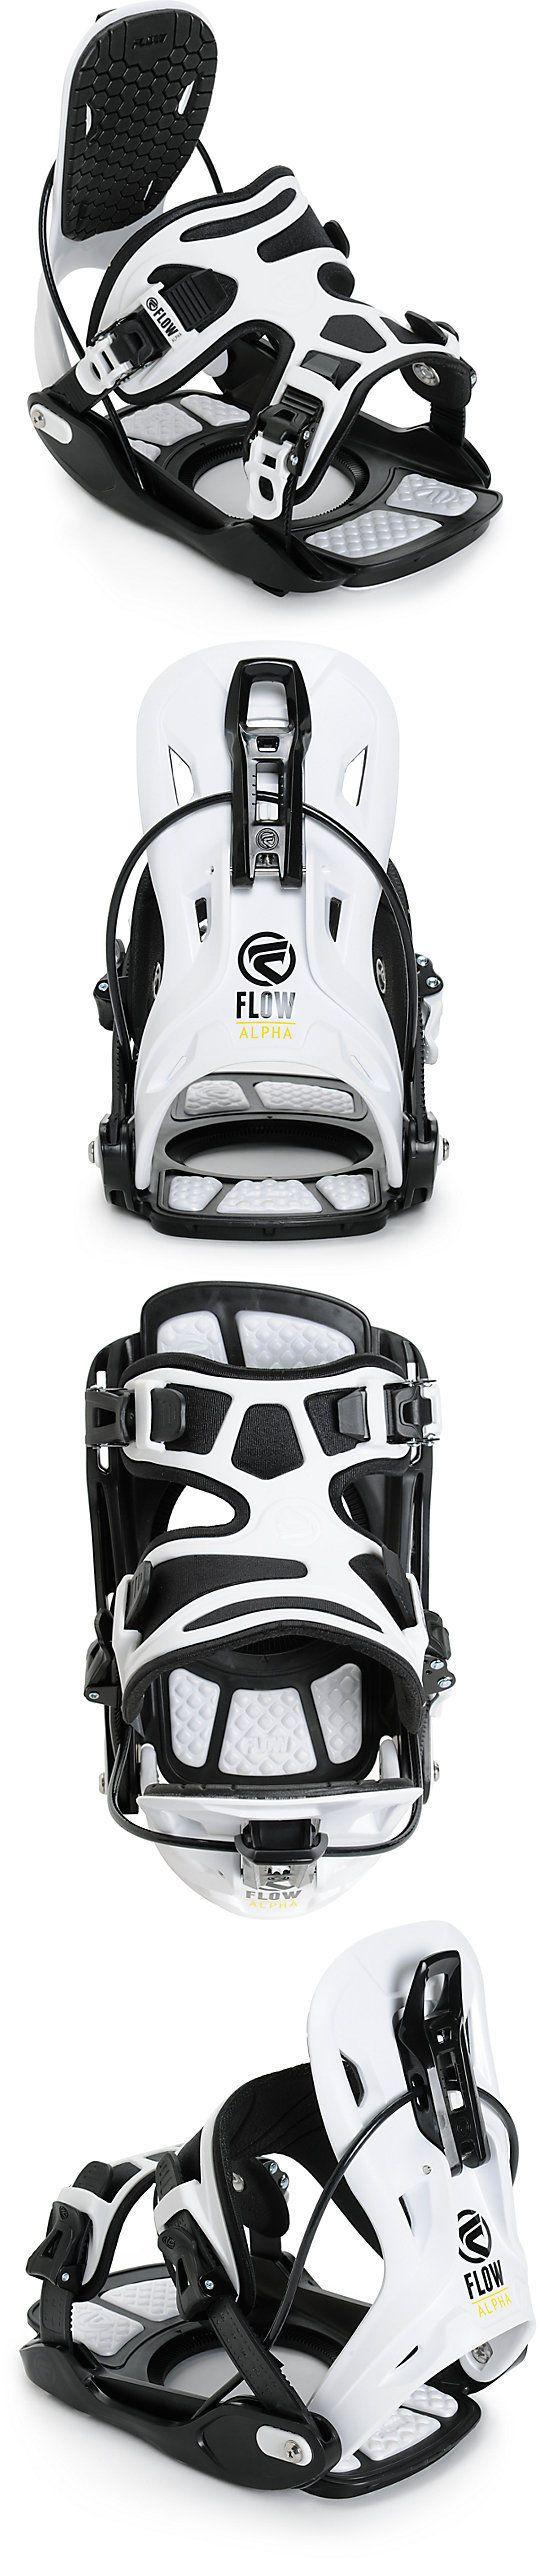 Bindings 21248: Alpha Stormtrooper Flow Snowboard Mens White Snowboard Bindings Size L -> BUY IT NOW ONLY: $44.99 on eBay!